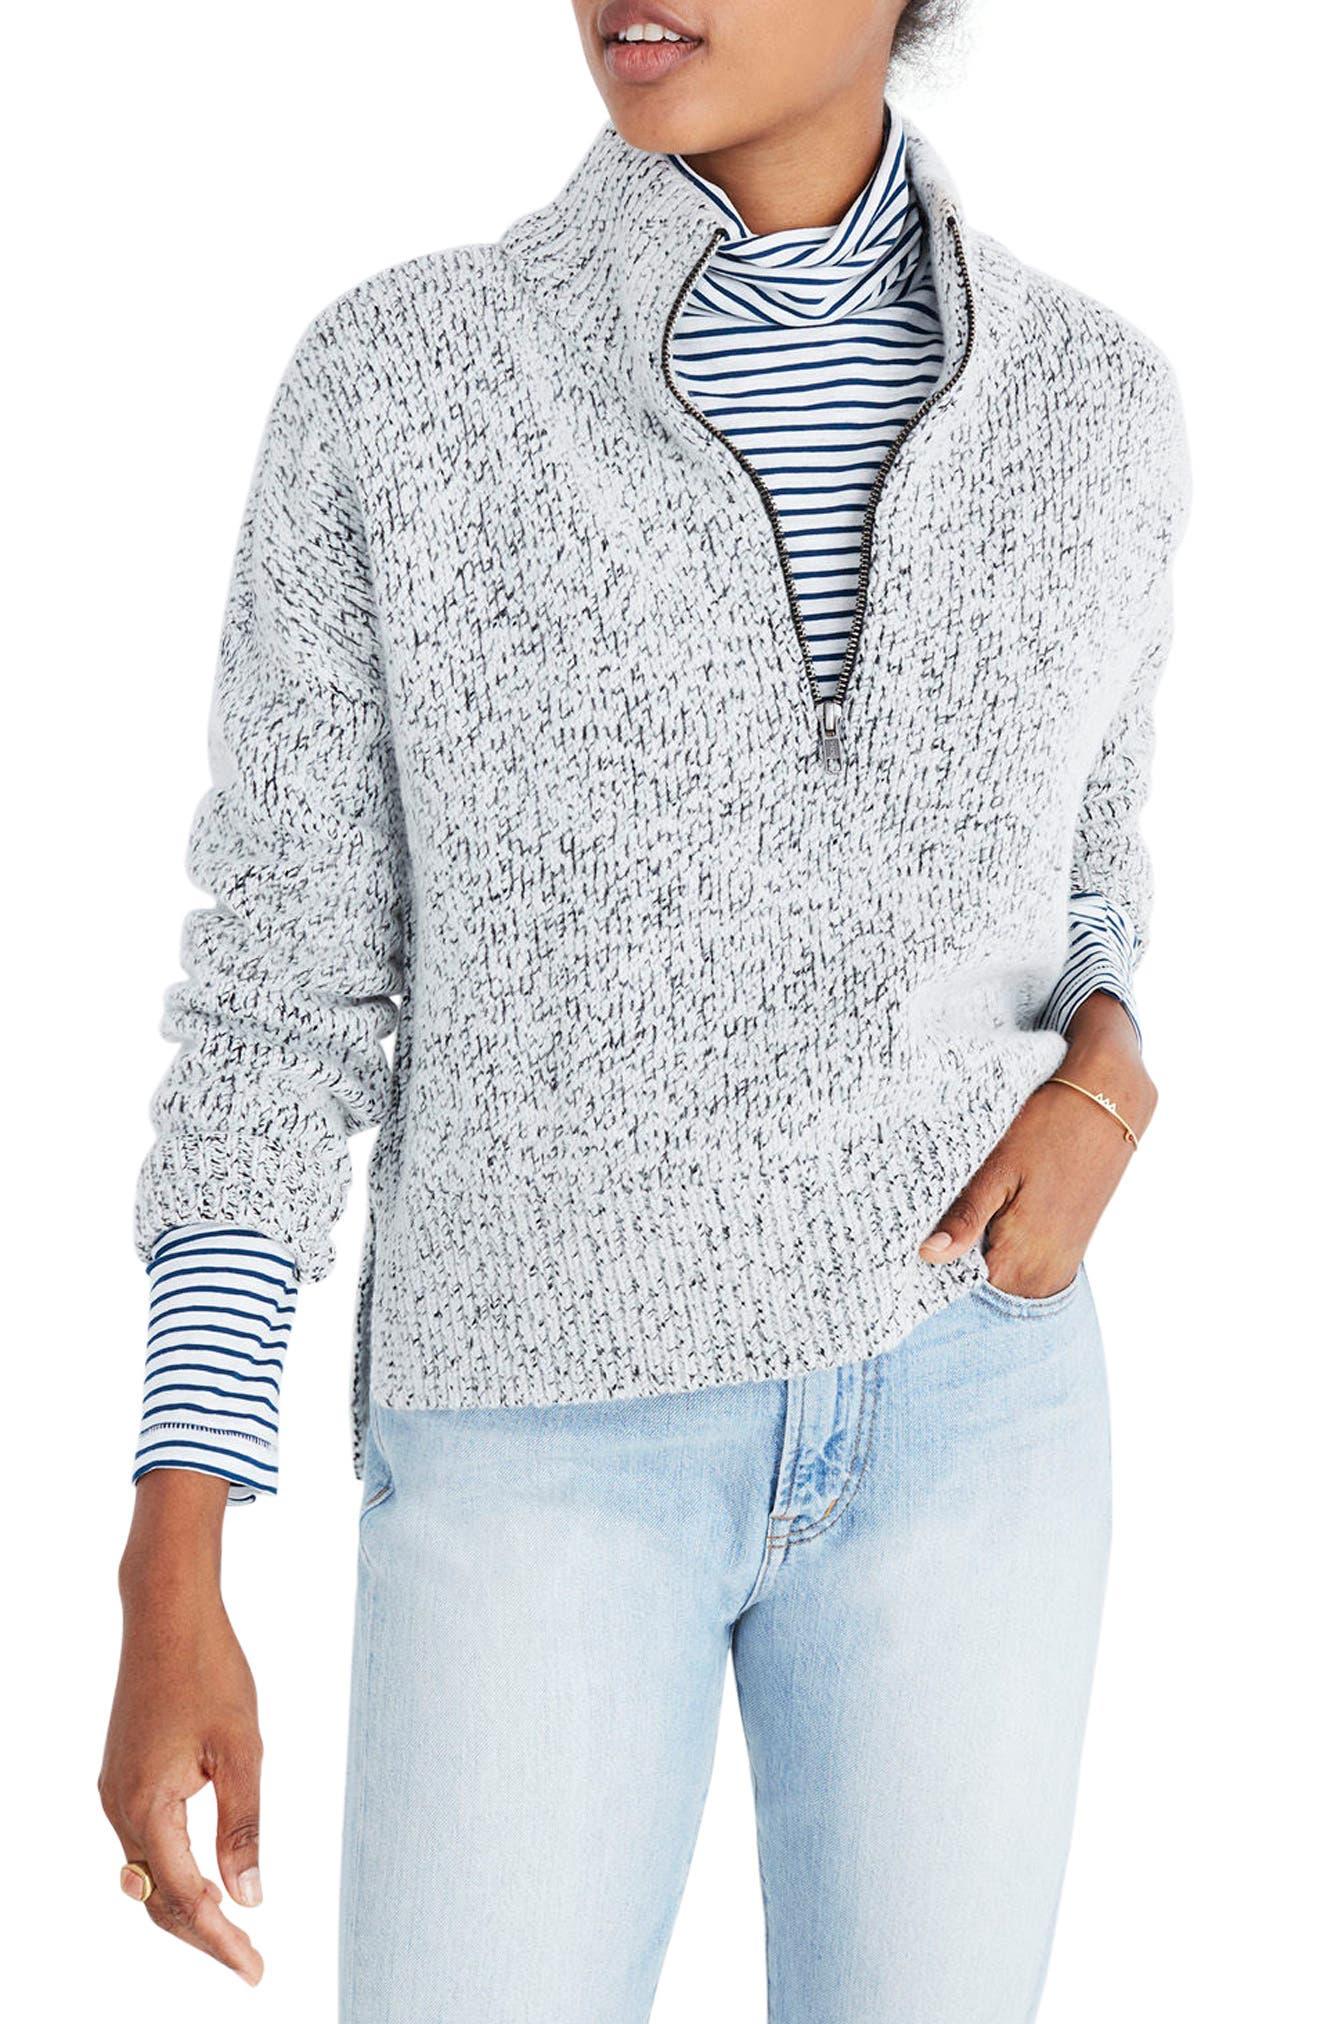 Alternate Image 1 Selected - Madewell Marled Half Zip Sweater